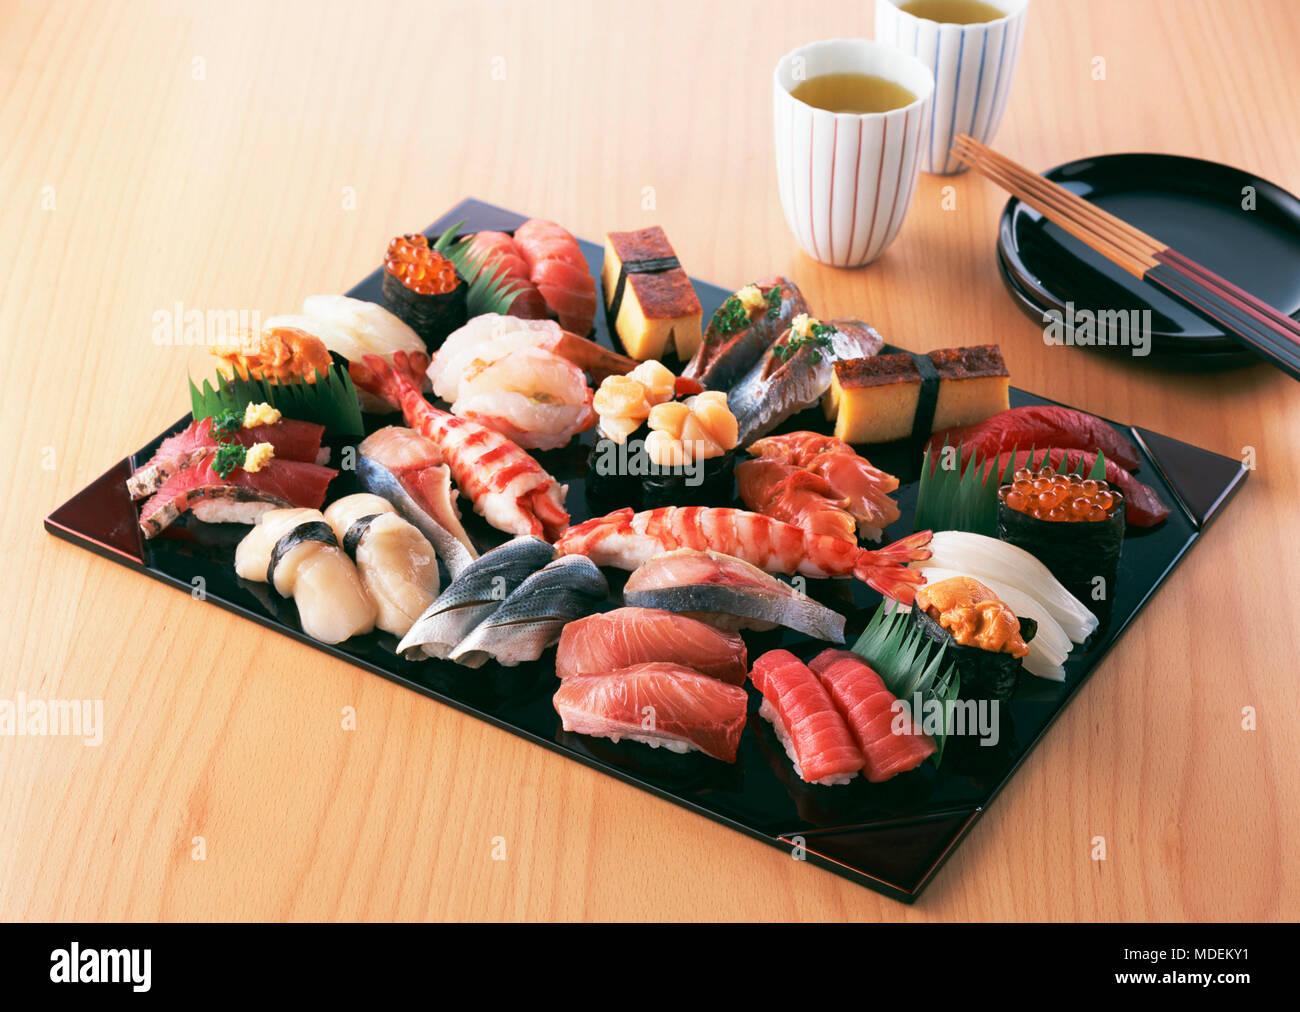 Seafoods Sushi Caviar Wood planks Food photo Roy - Stock Image